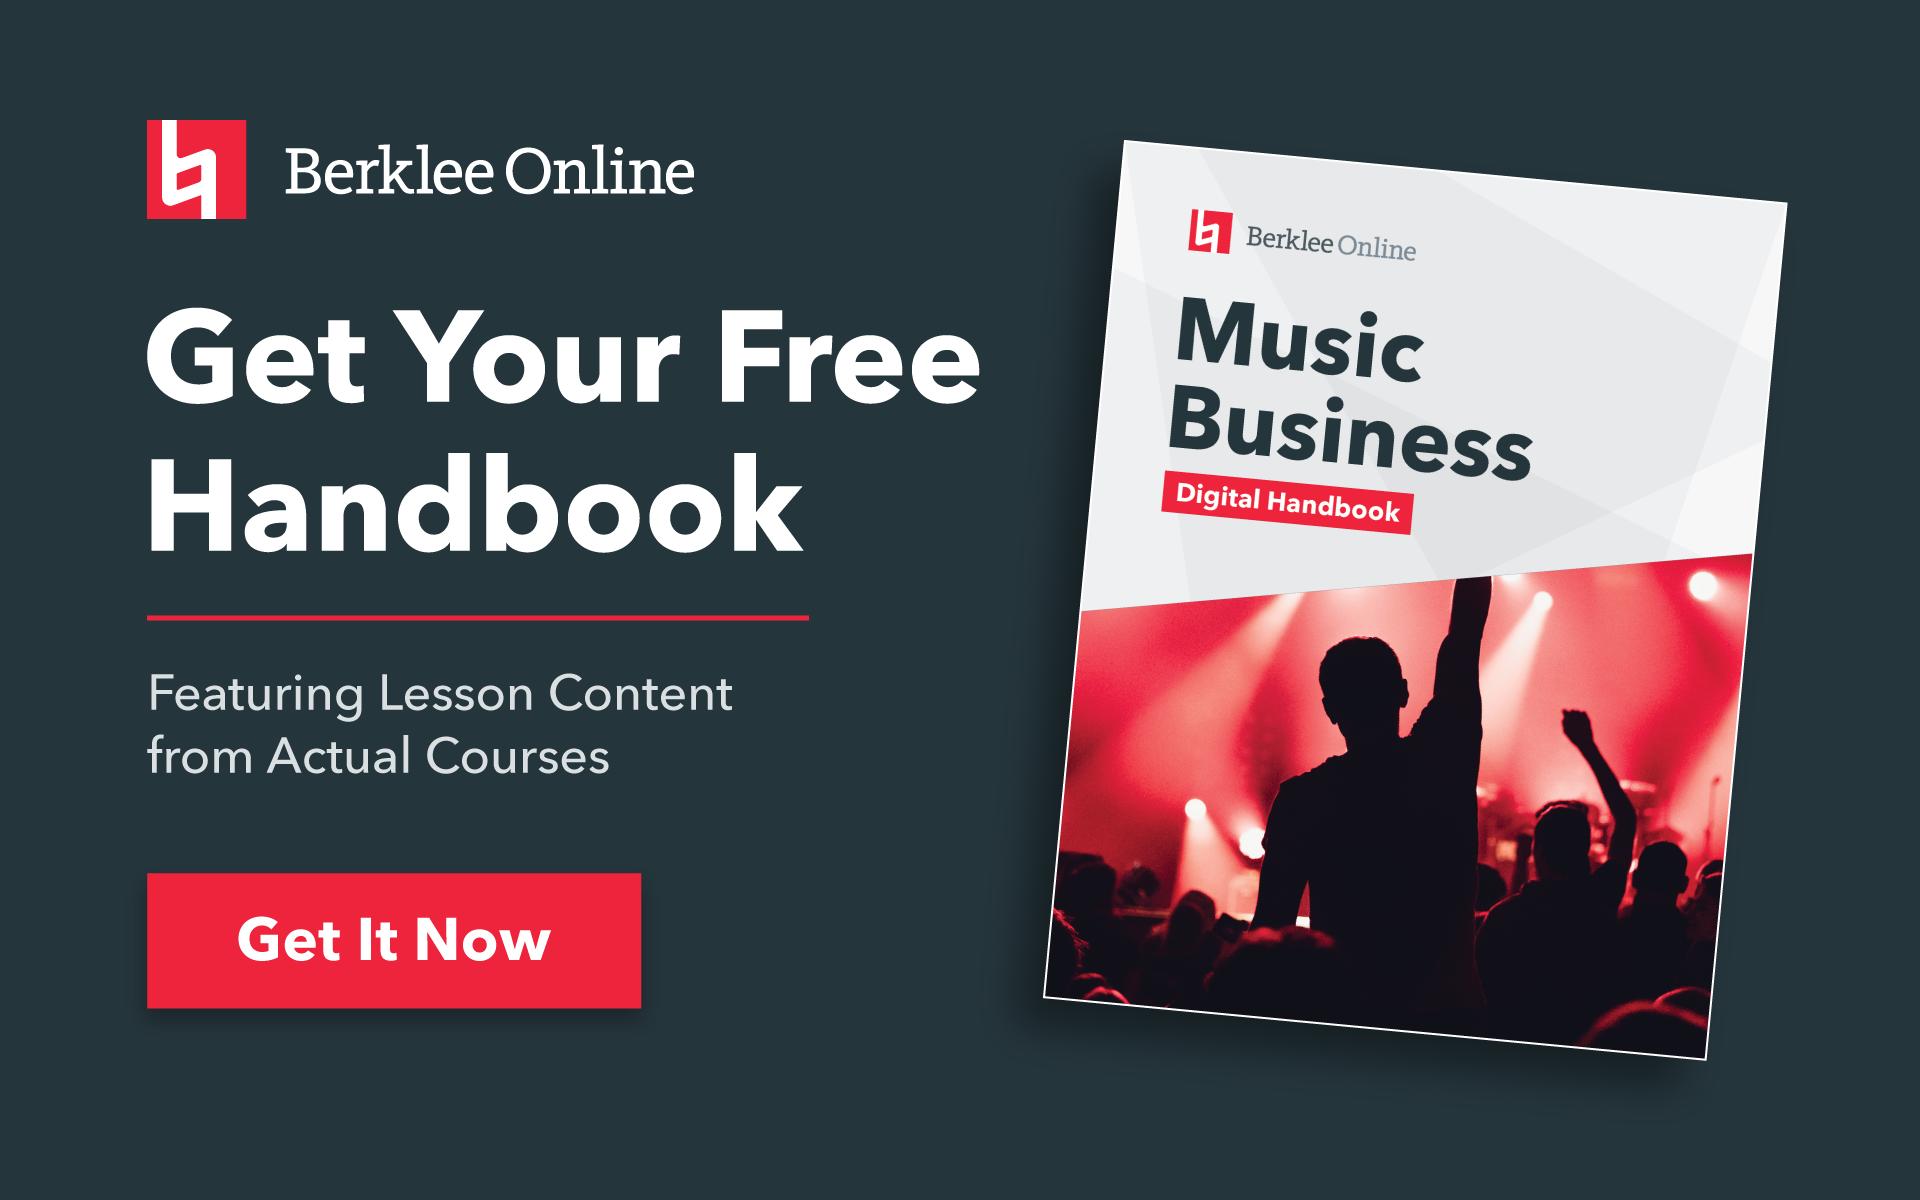 Get your free music business handbook from Berklee Online.